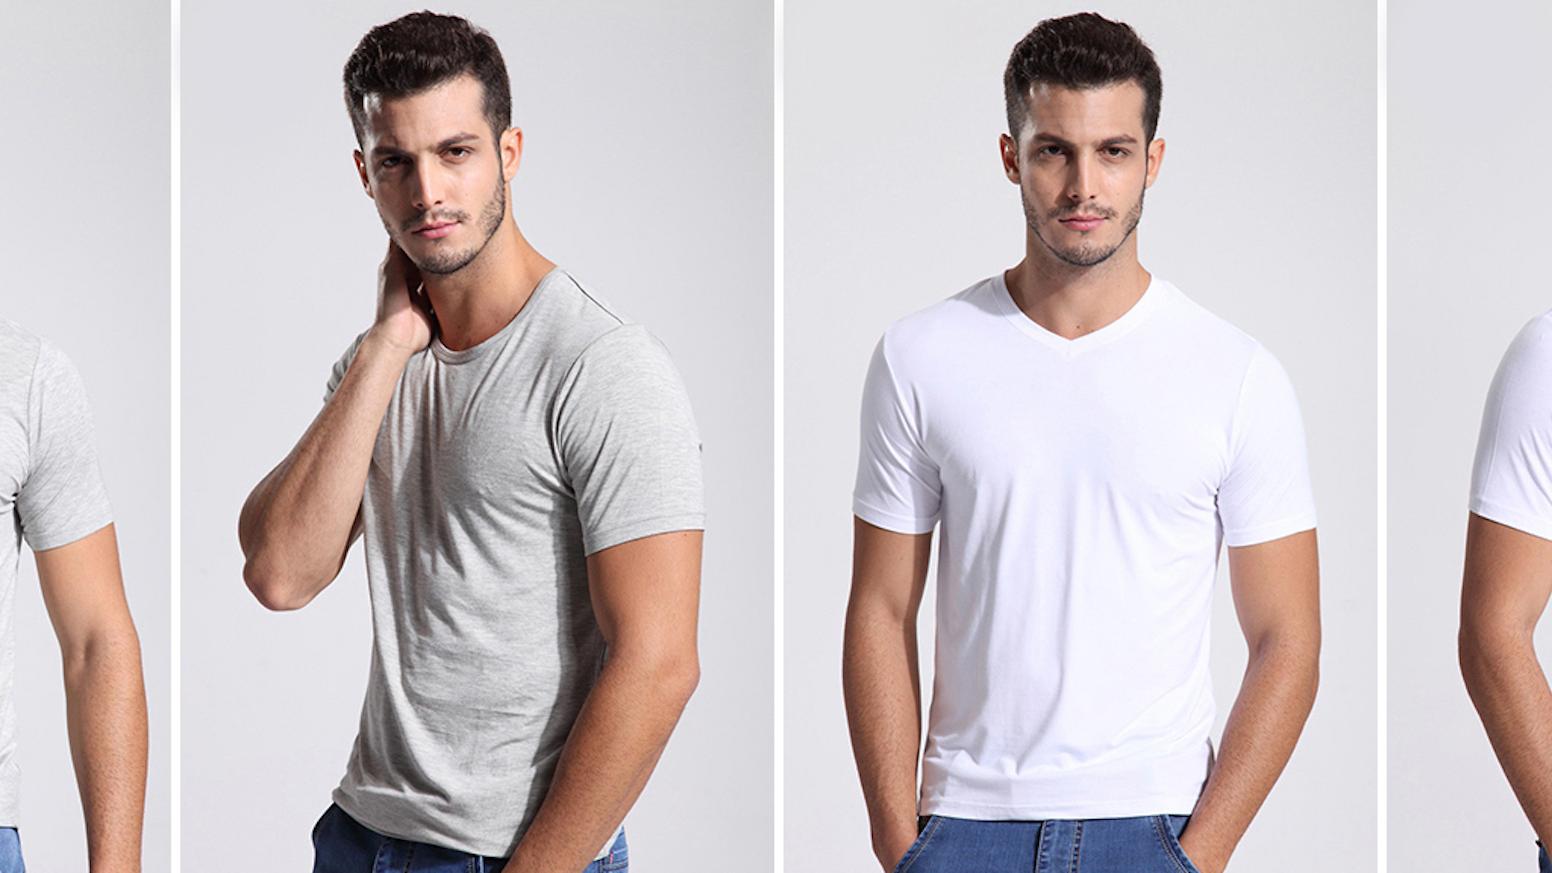 Bamboo viscose undershirts; classic, premium quality without the luxury markup